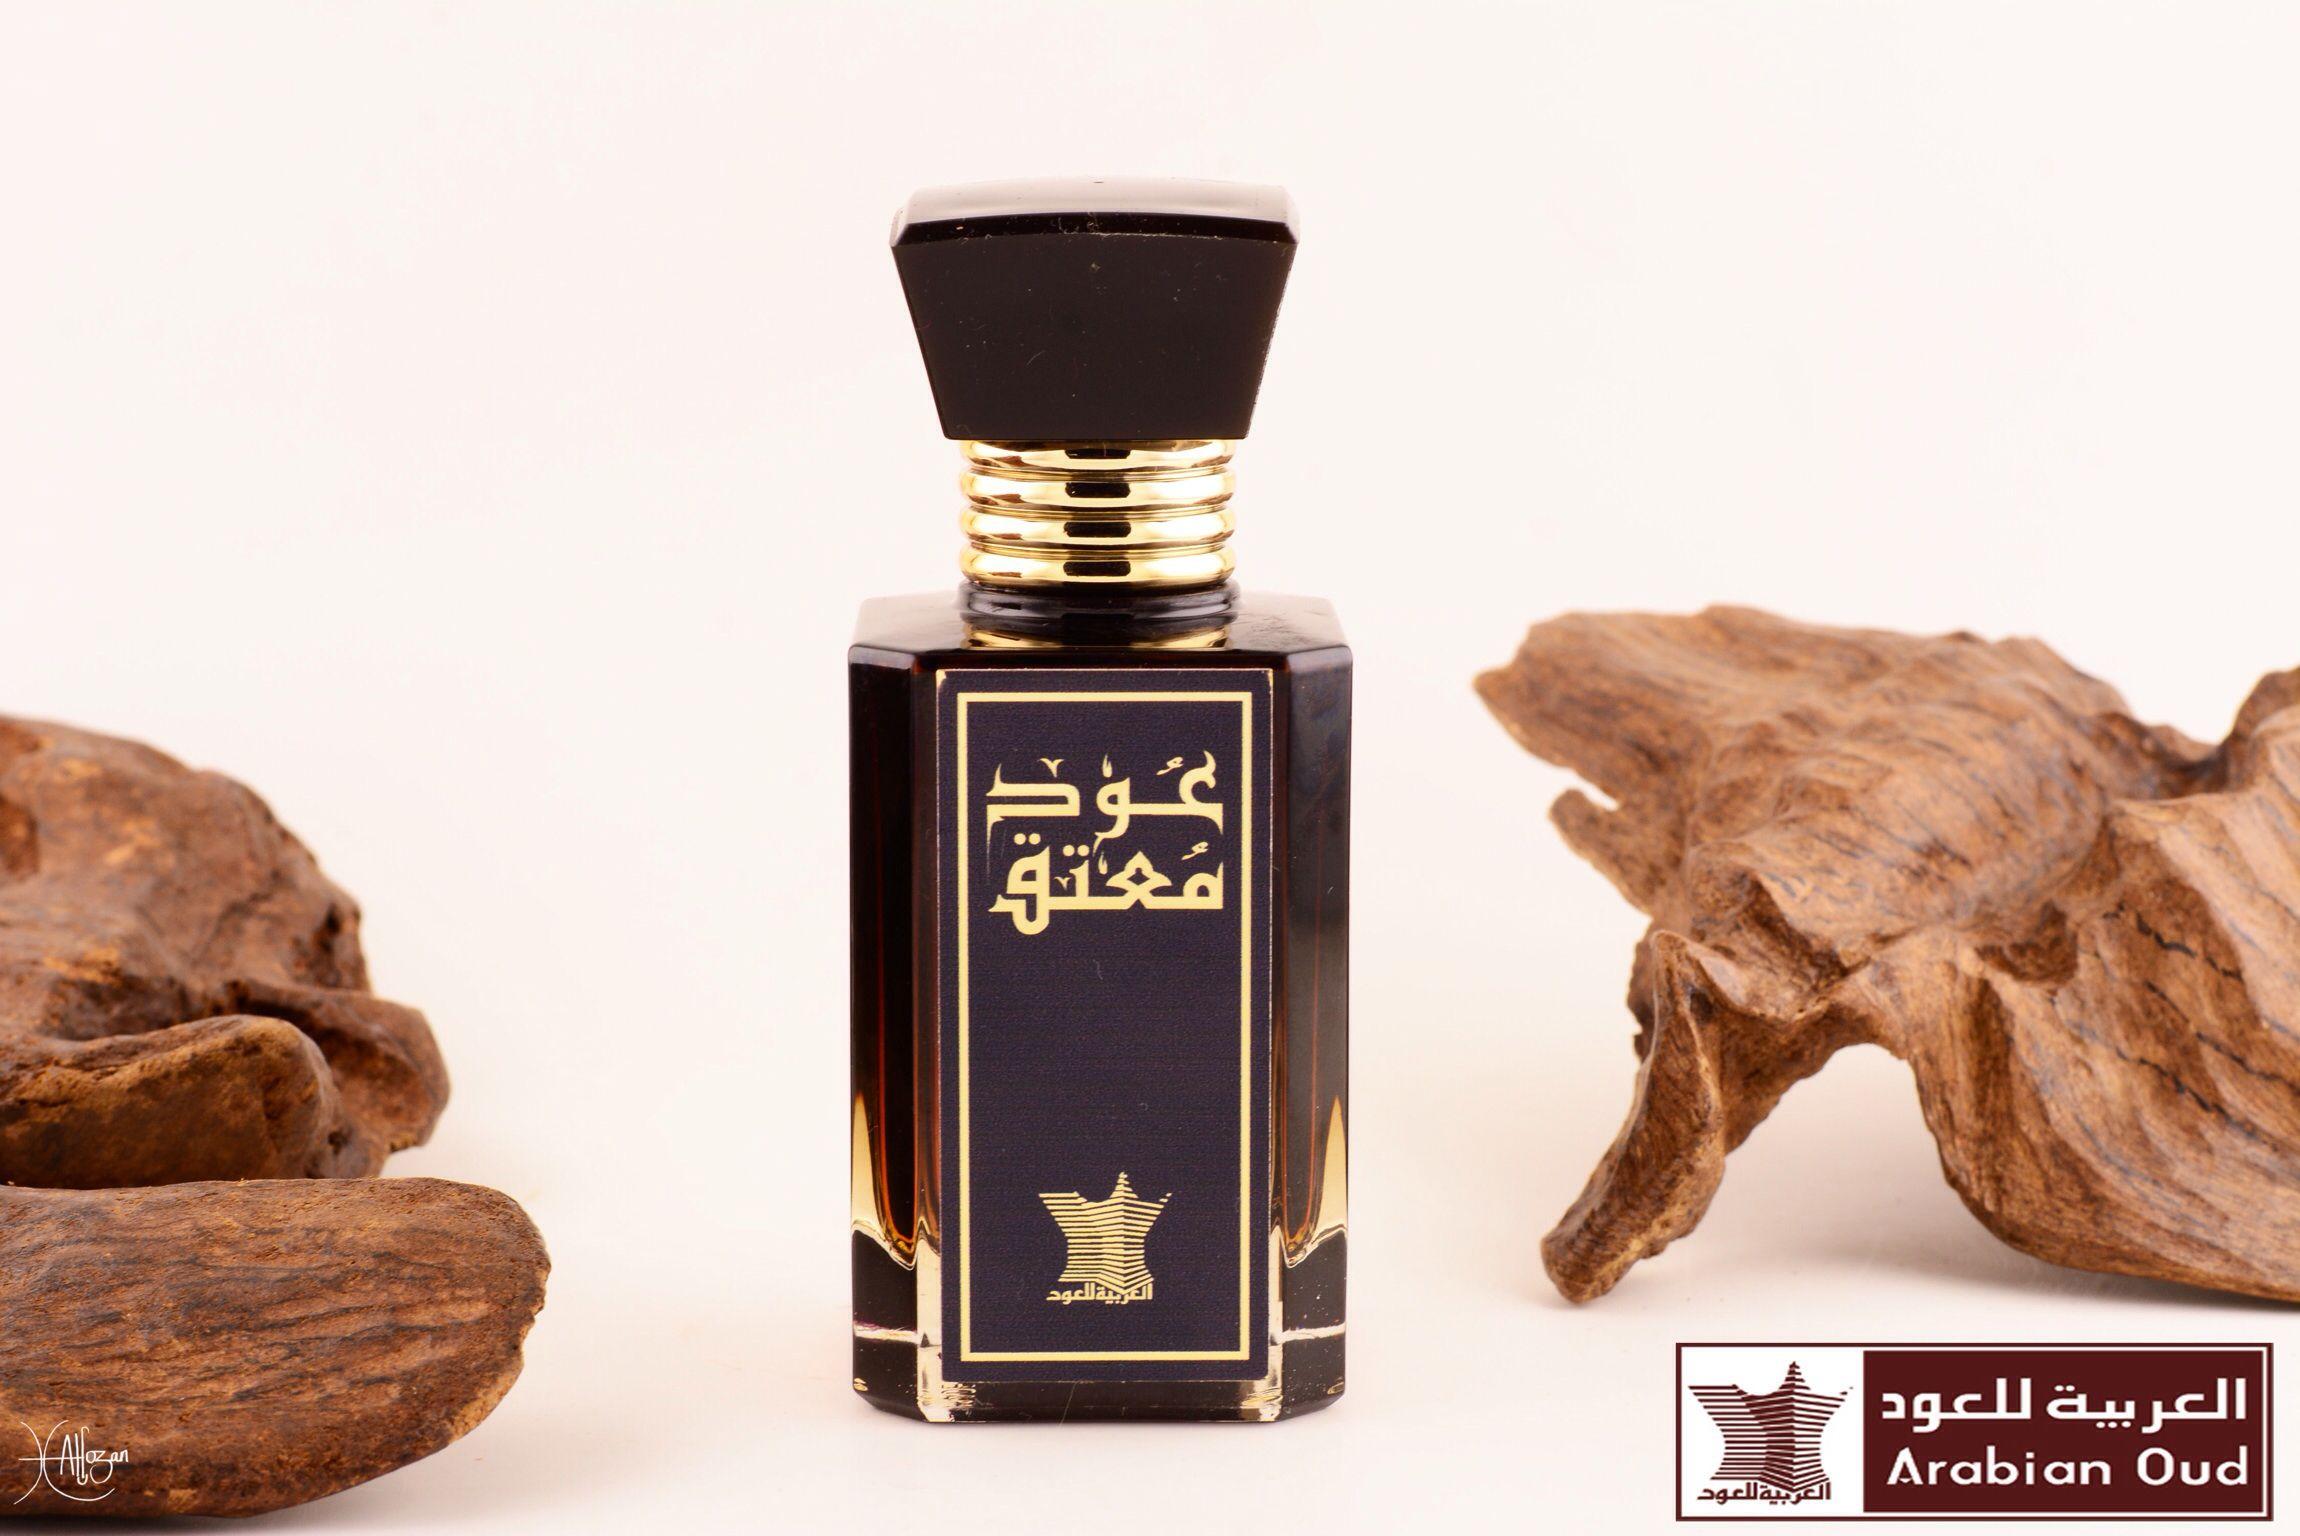 951cb5e2d Oud perfume from Arabian oud   Perfumes   Perfume, Perfume bottles ...